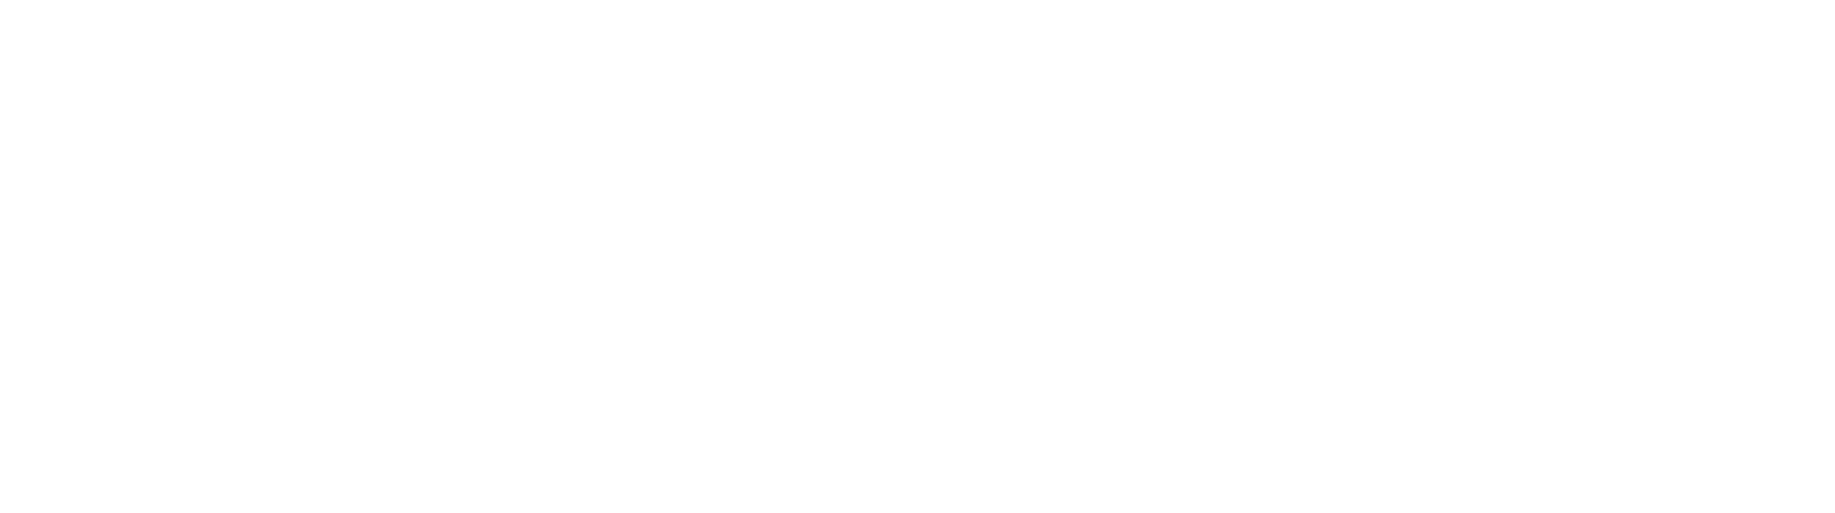 n1 capital tijuana nominas